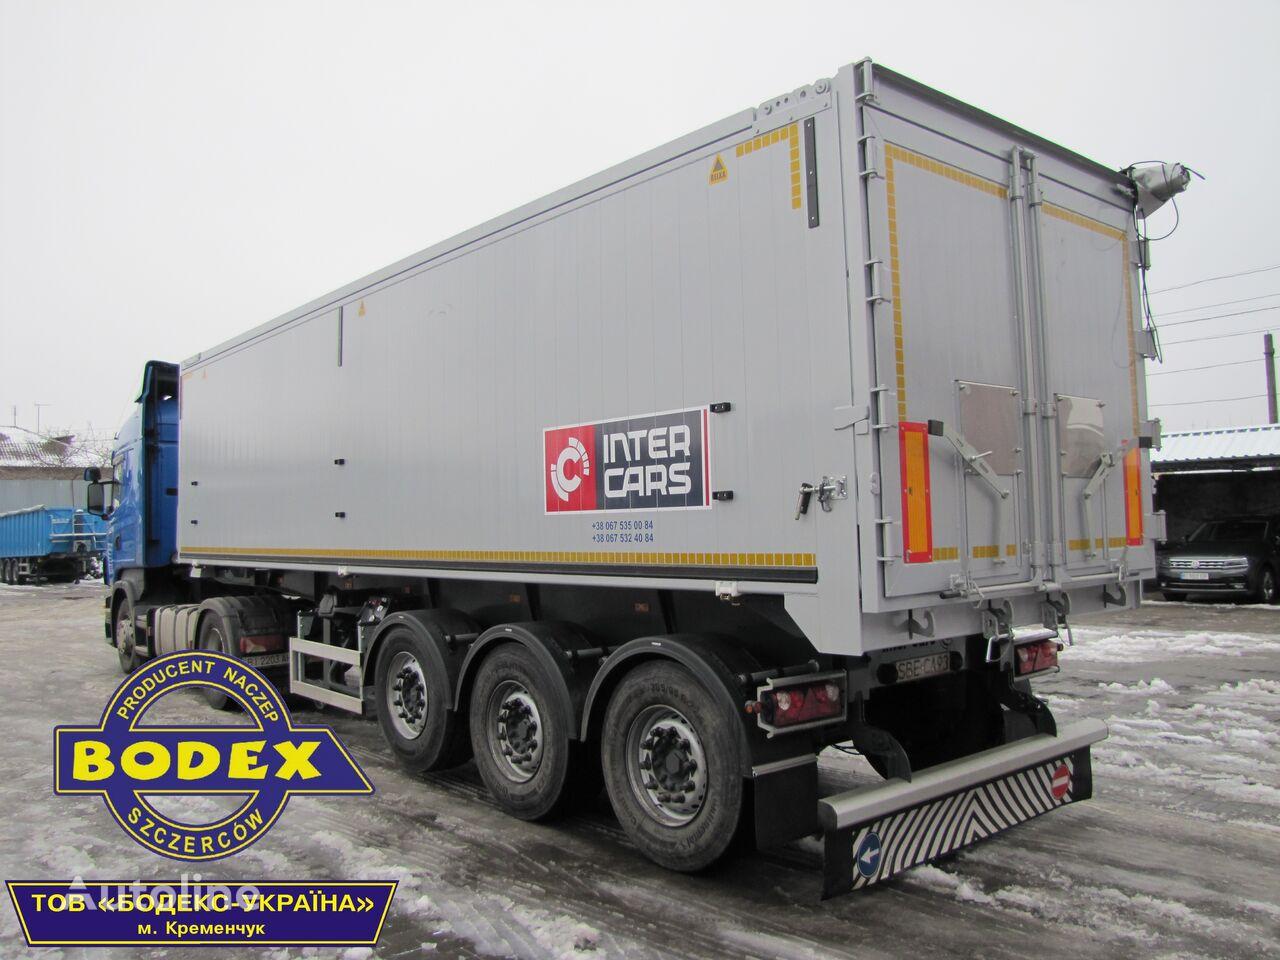 BODEX KIS 3B 45m3 tipper semi-trailer